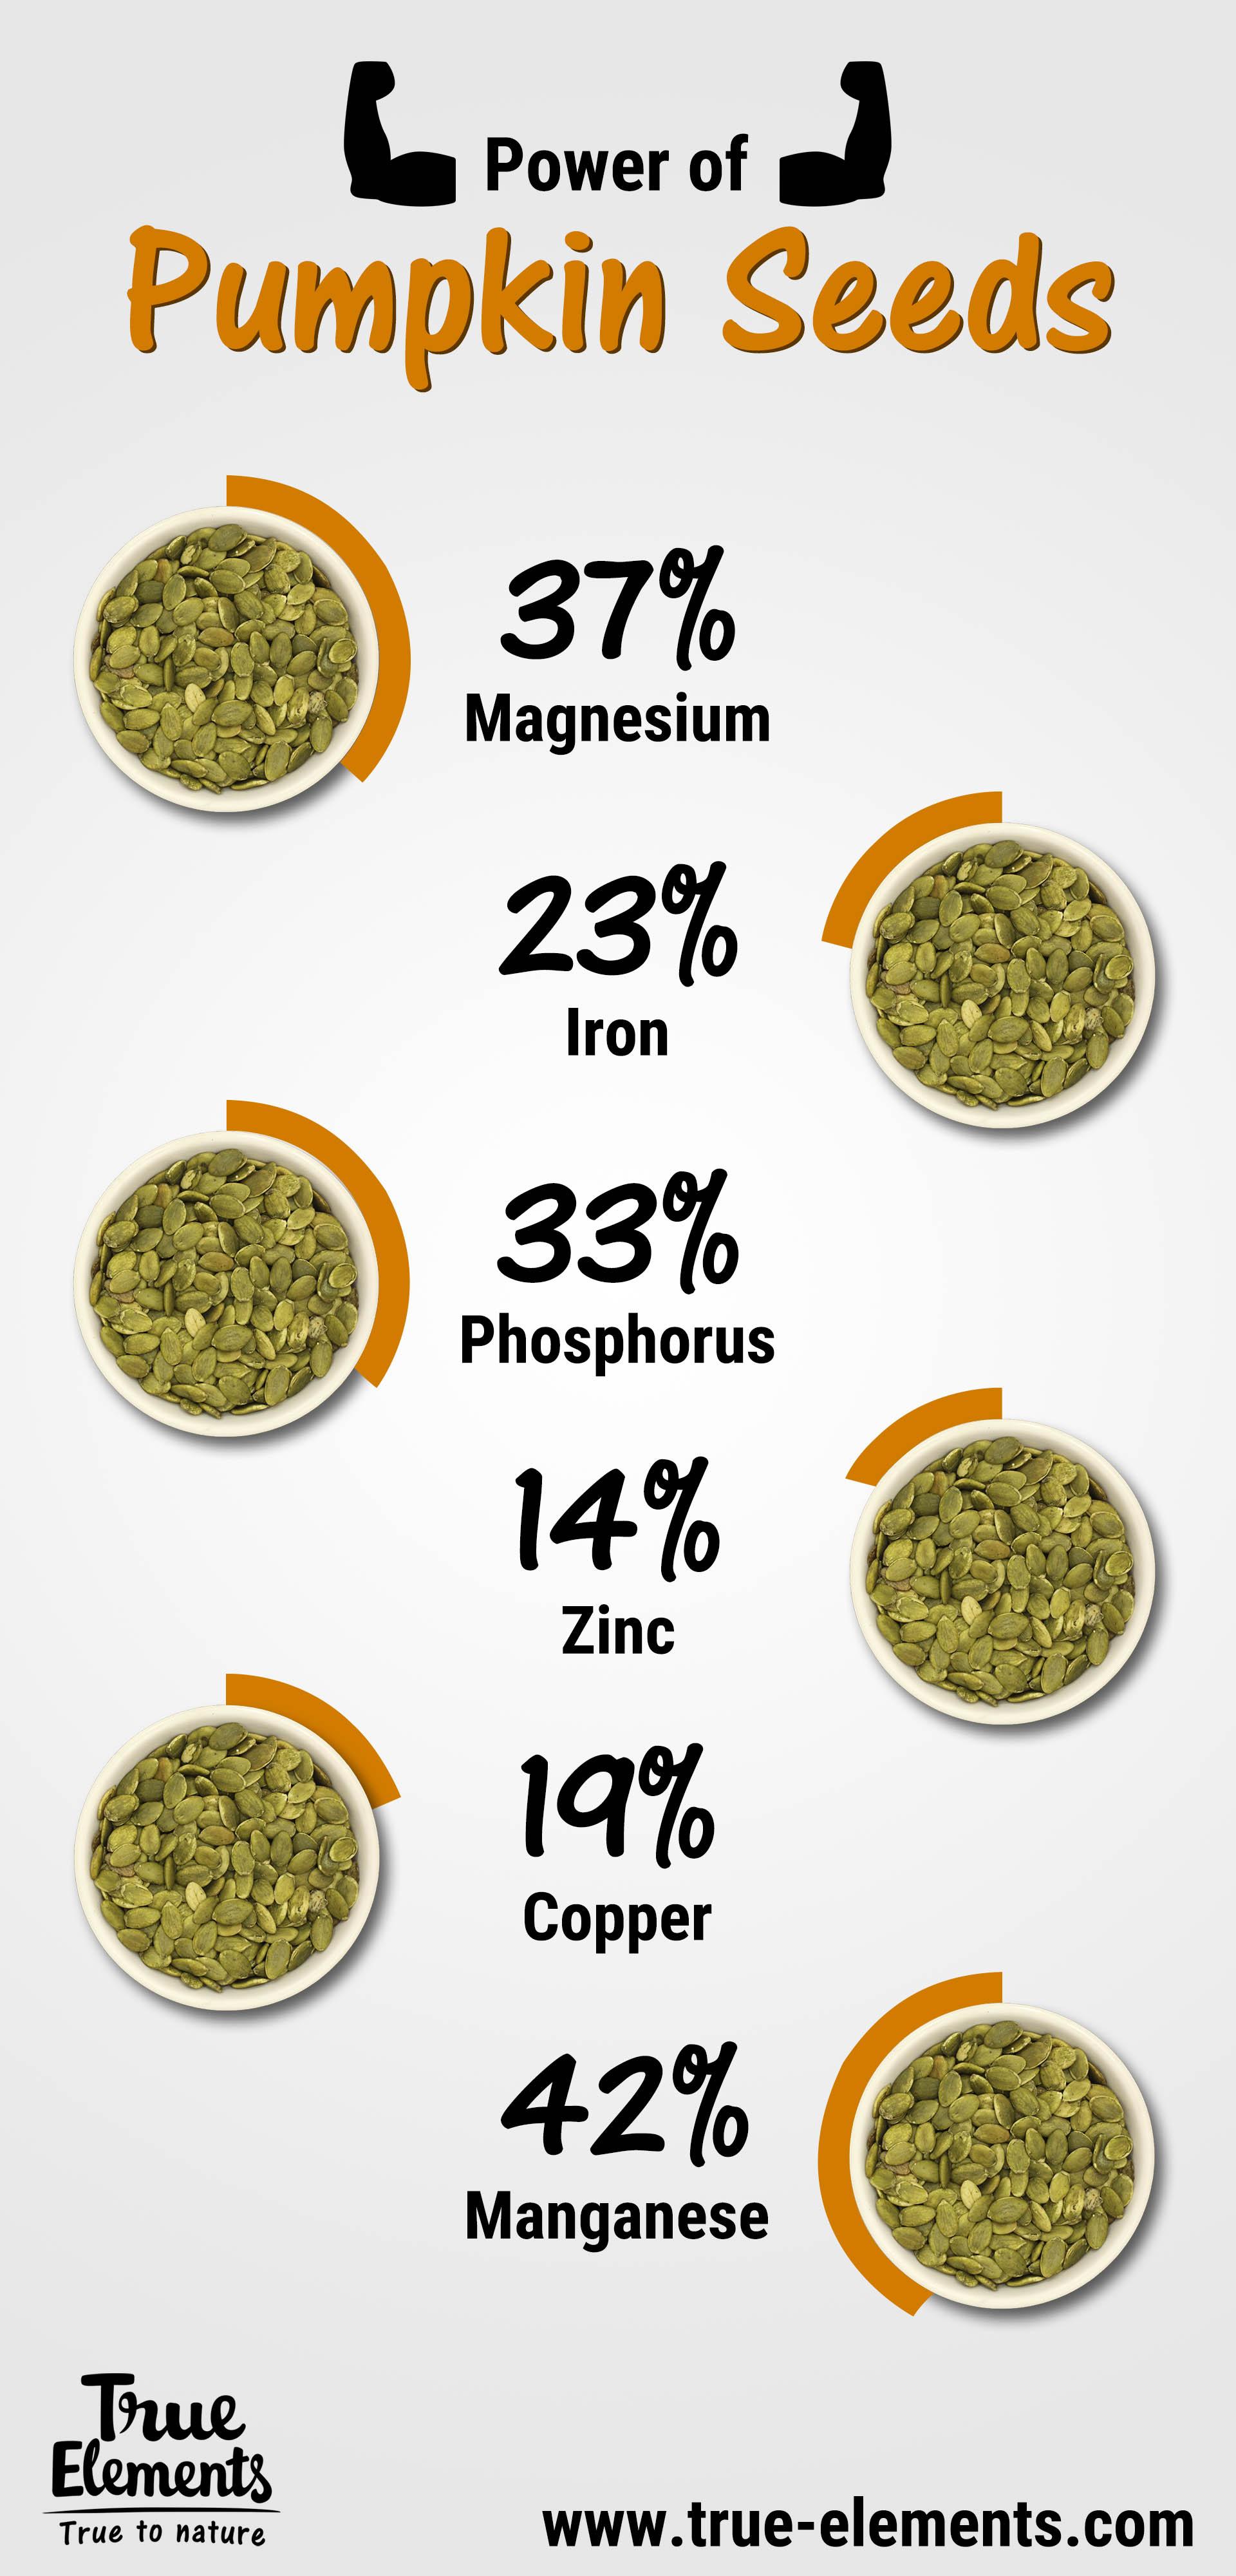 pumpkin-seeds-comparison-infographic-plaza